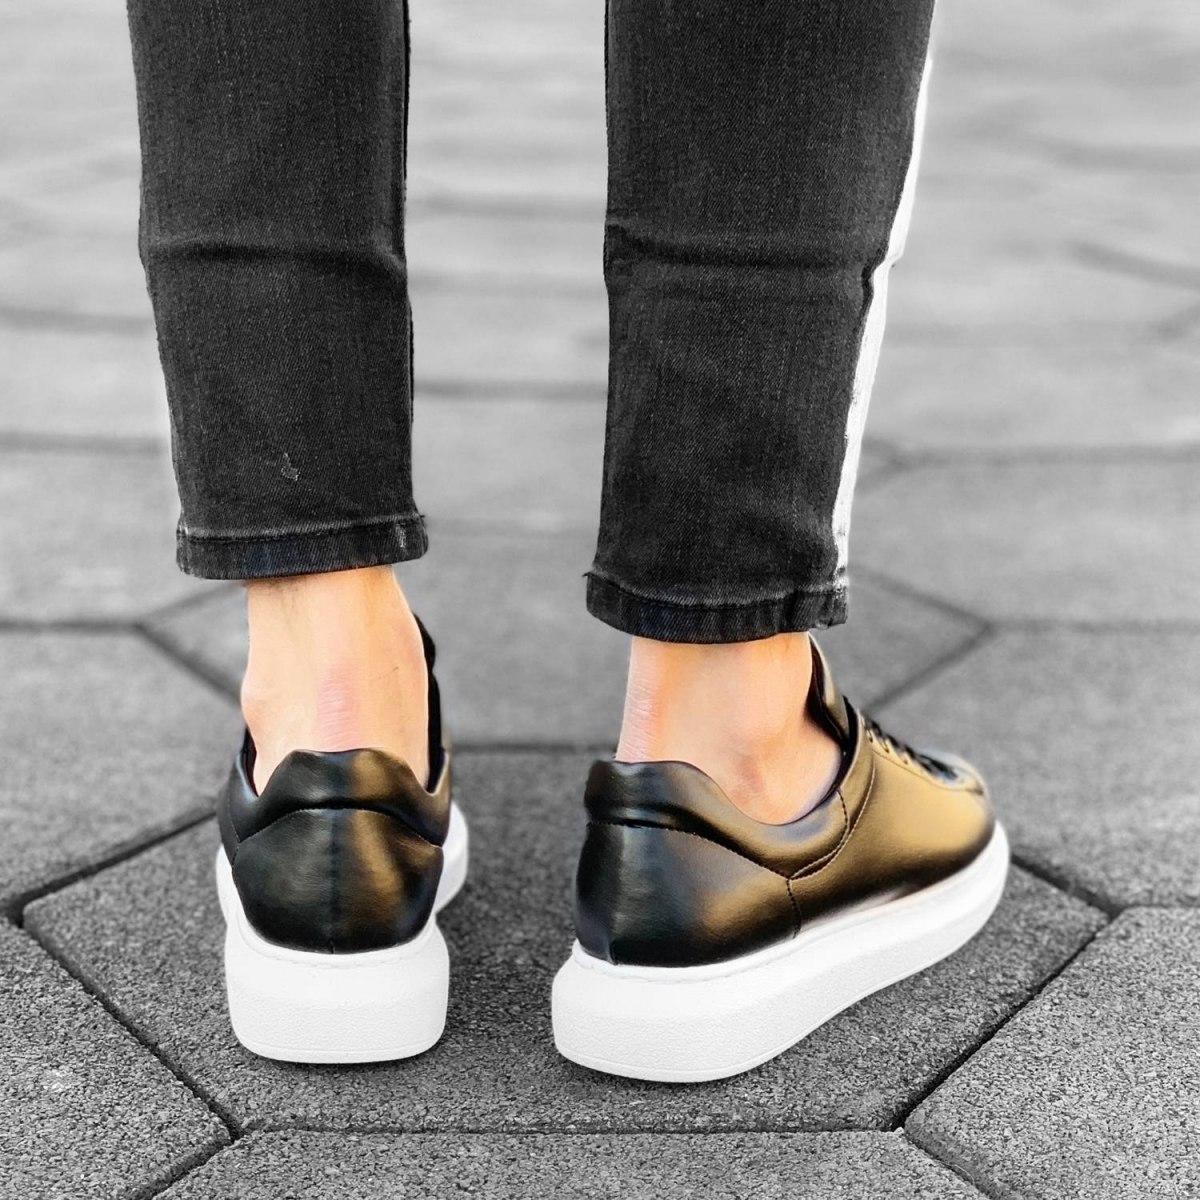 MV Mega Sole in Matte Black&White Sneaker MV Sneaker Collection - 4